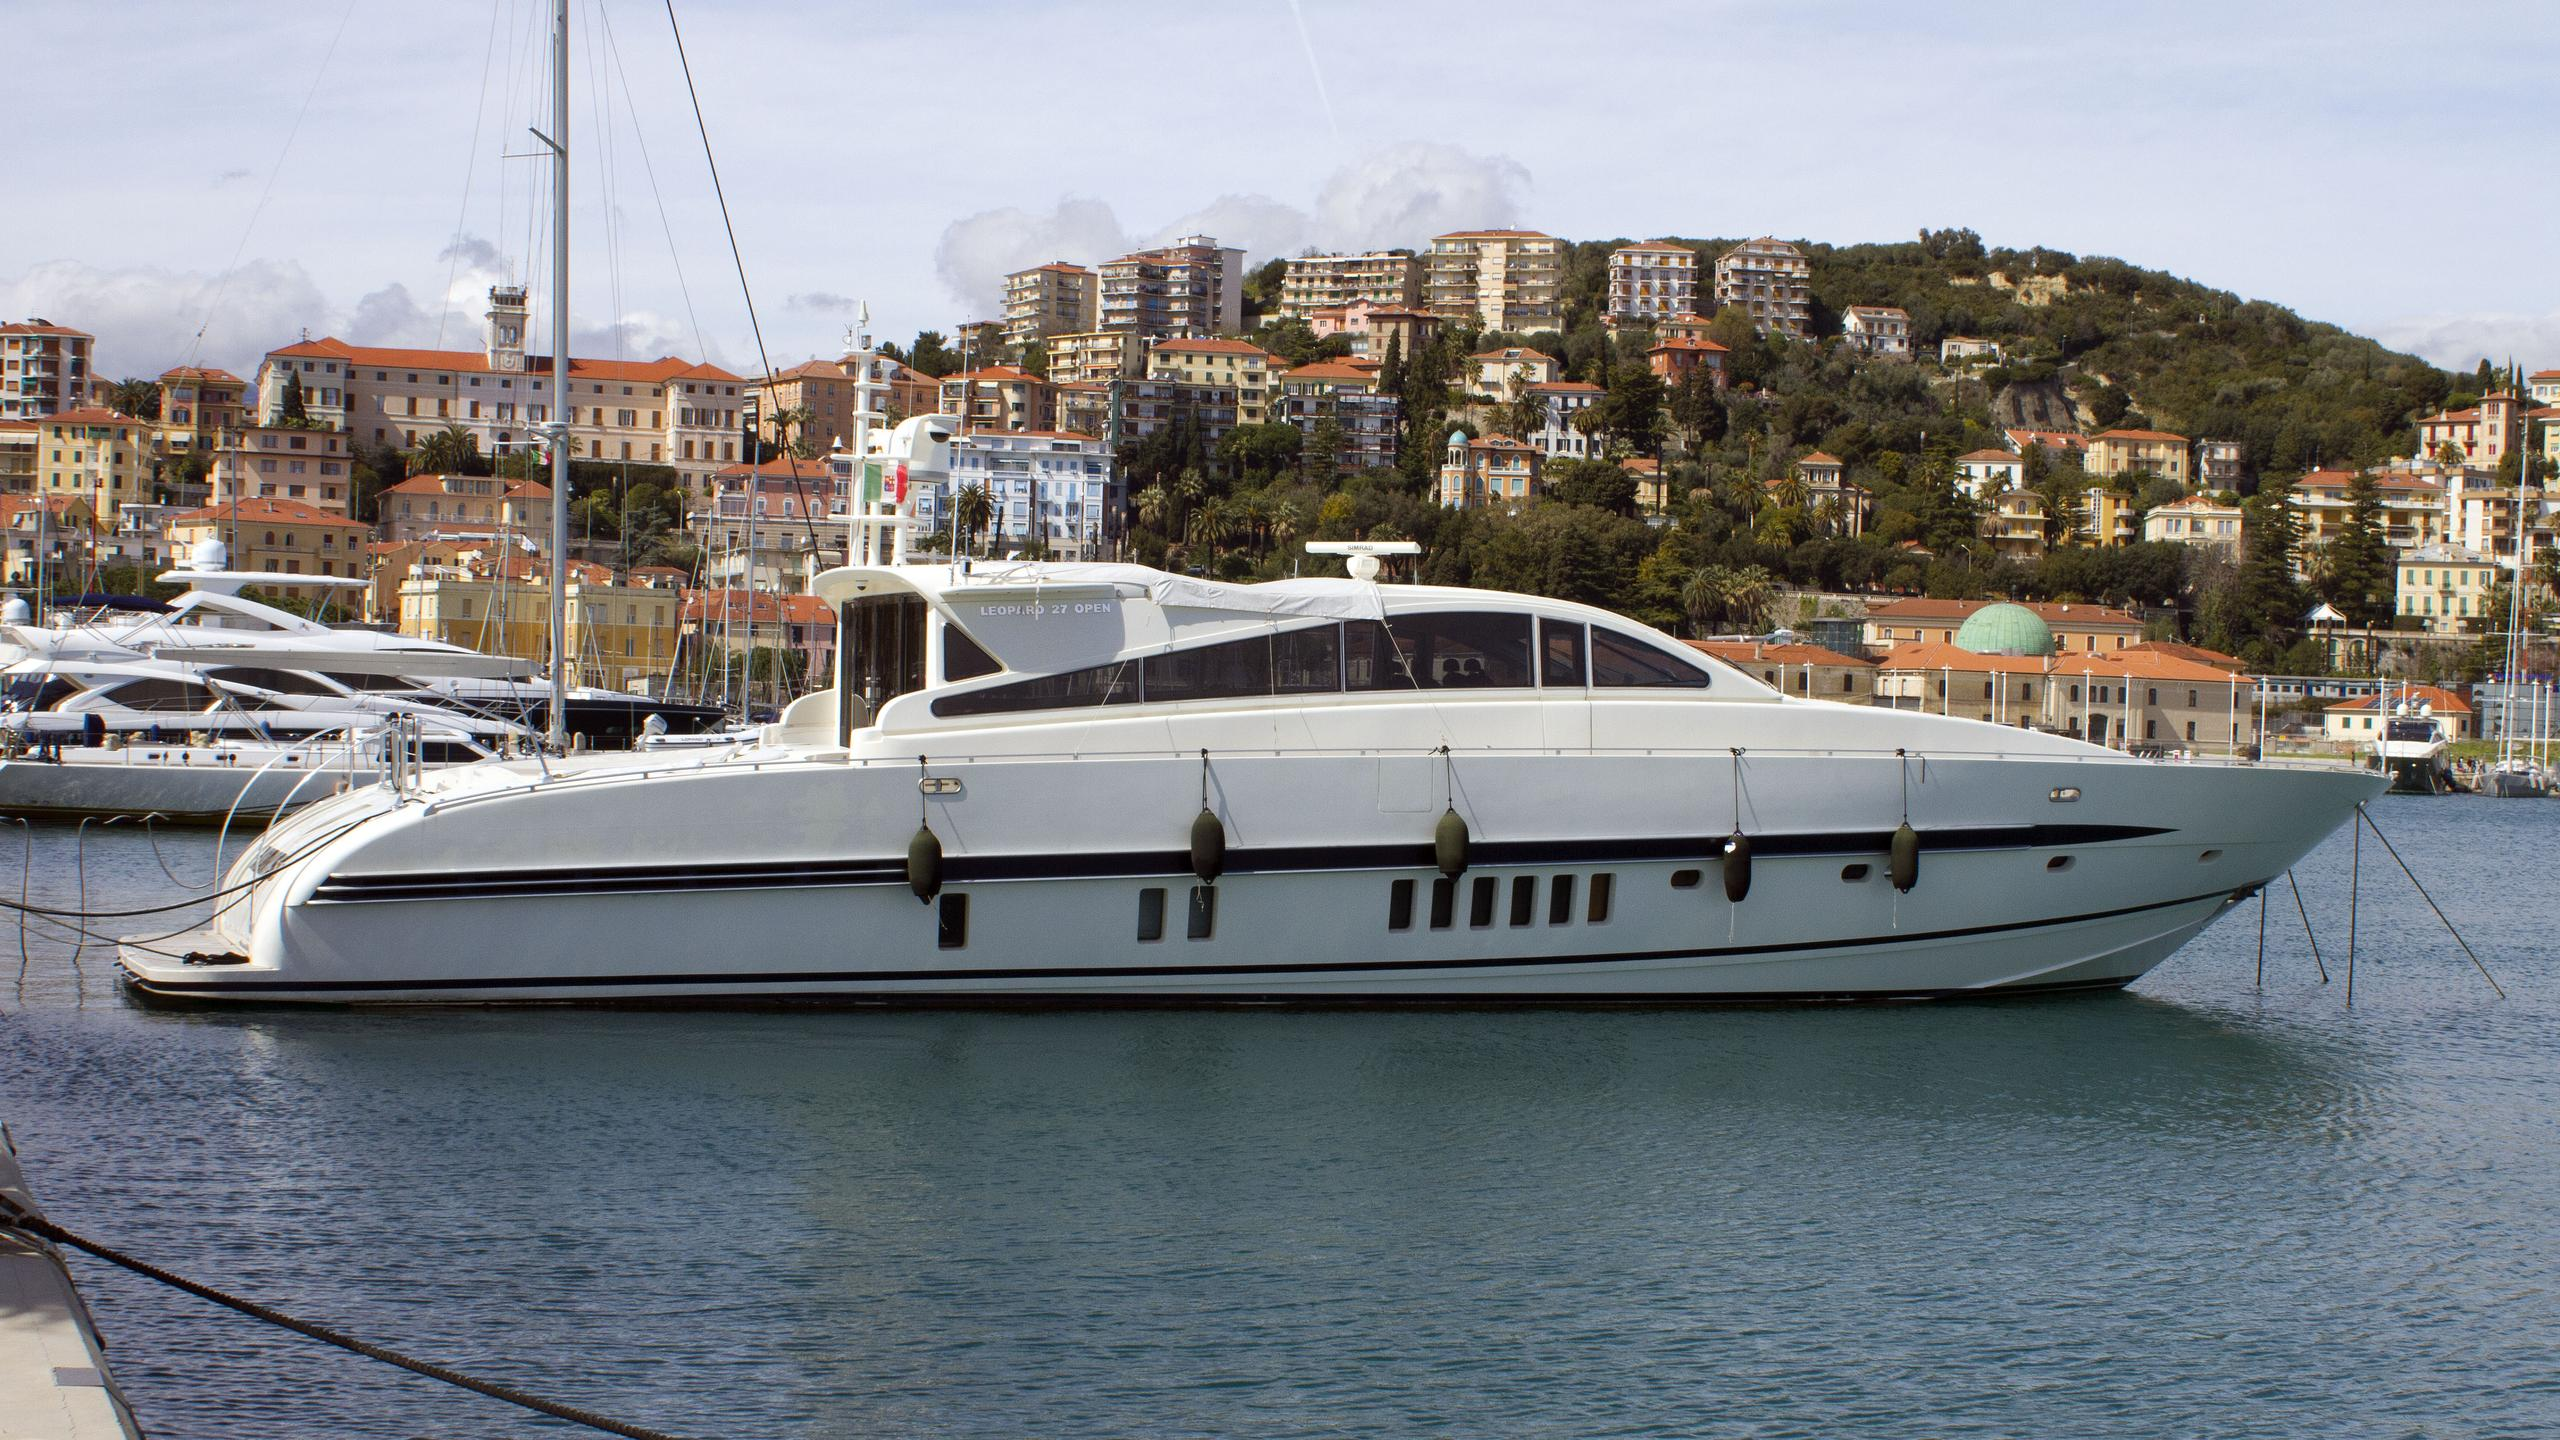 cita romas 3 motoryacht arno leopard 27 2001 27m profile